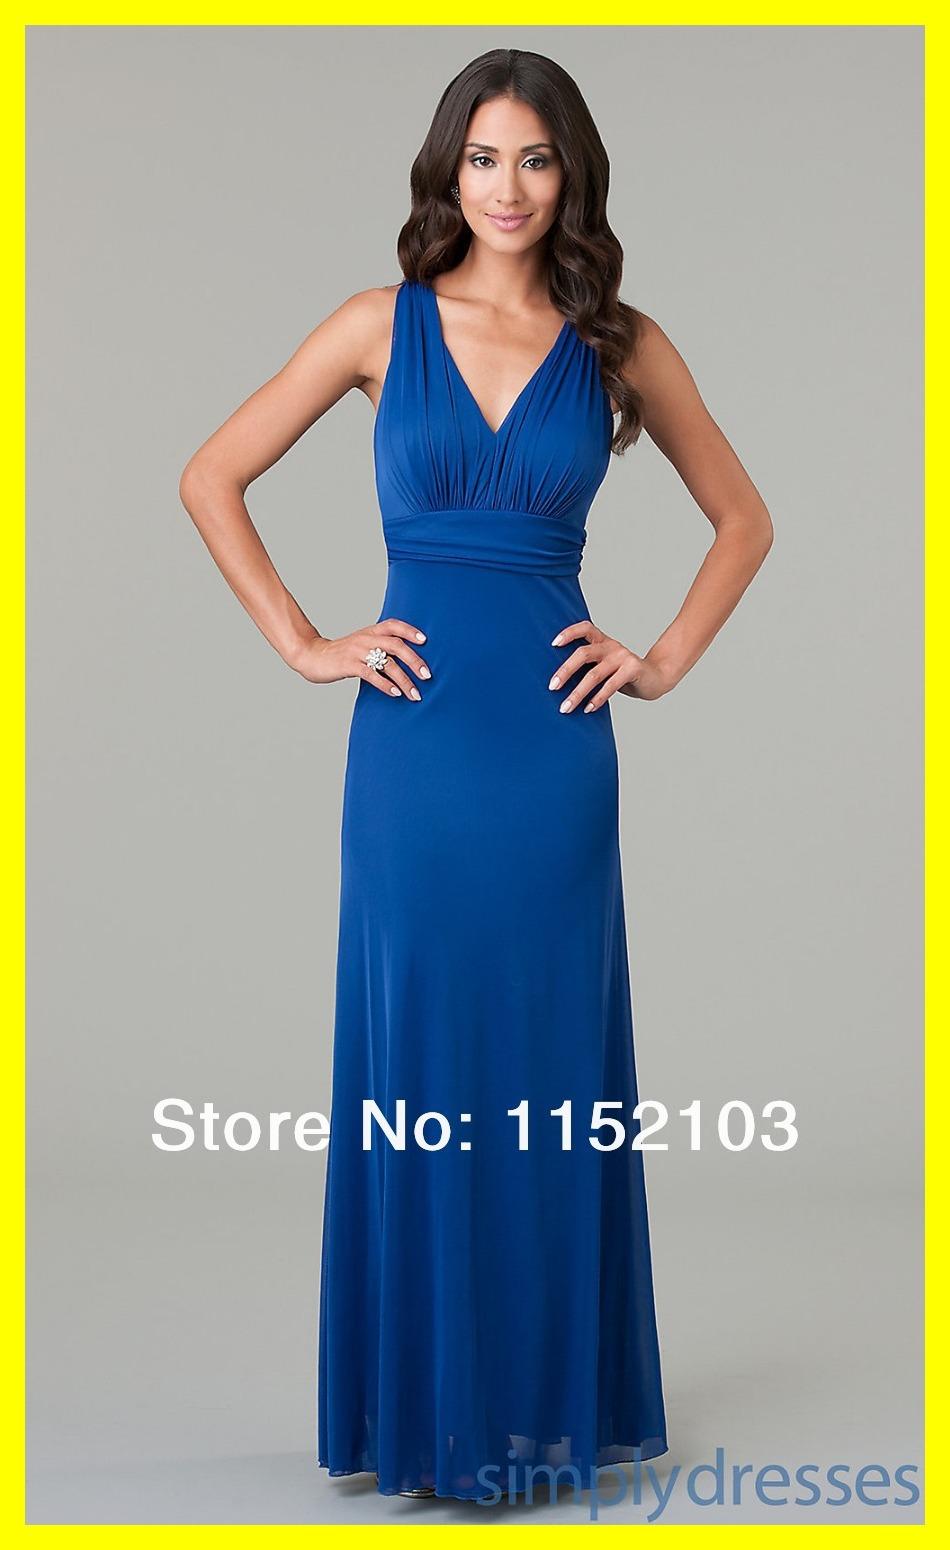 Prom Dresses Miami Fl - Homecoming Prom Dresses